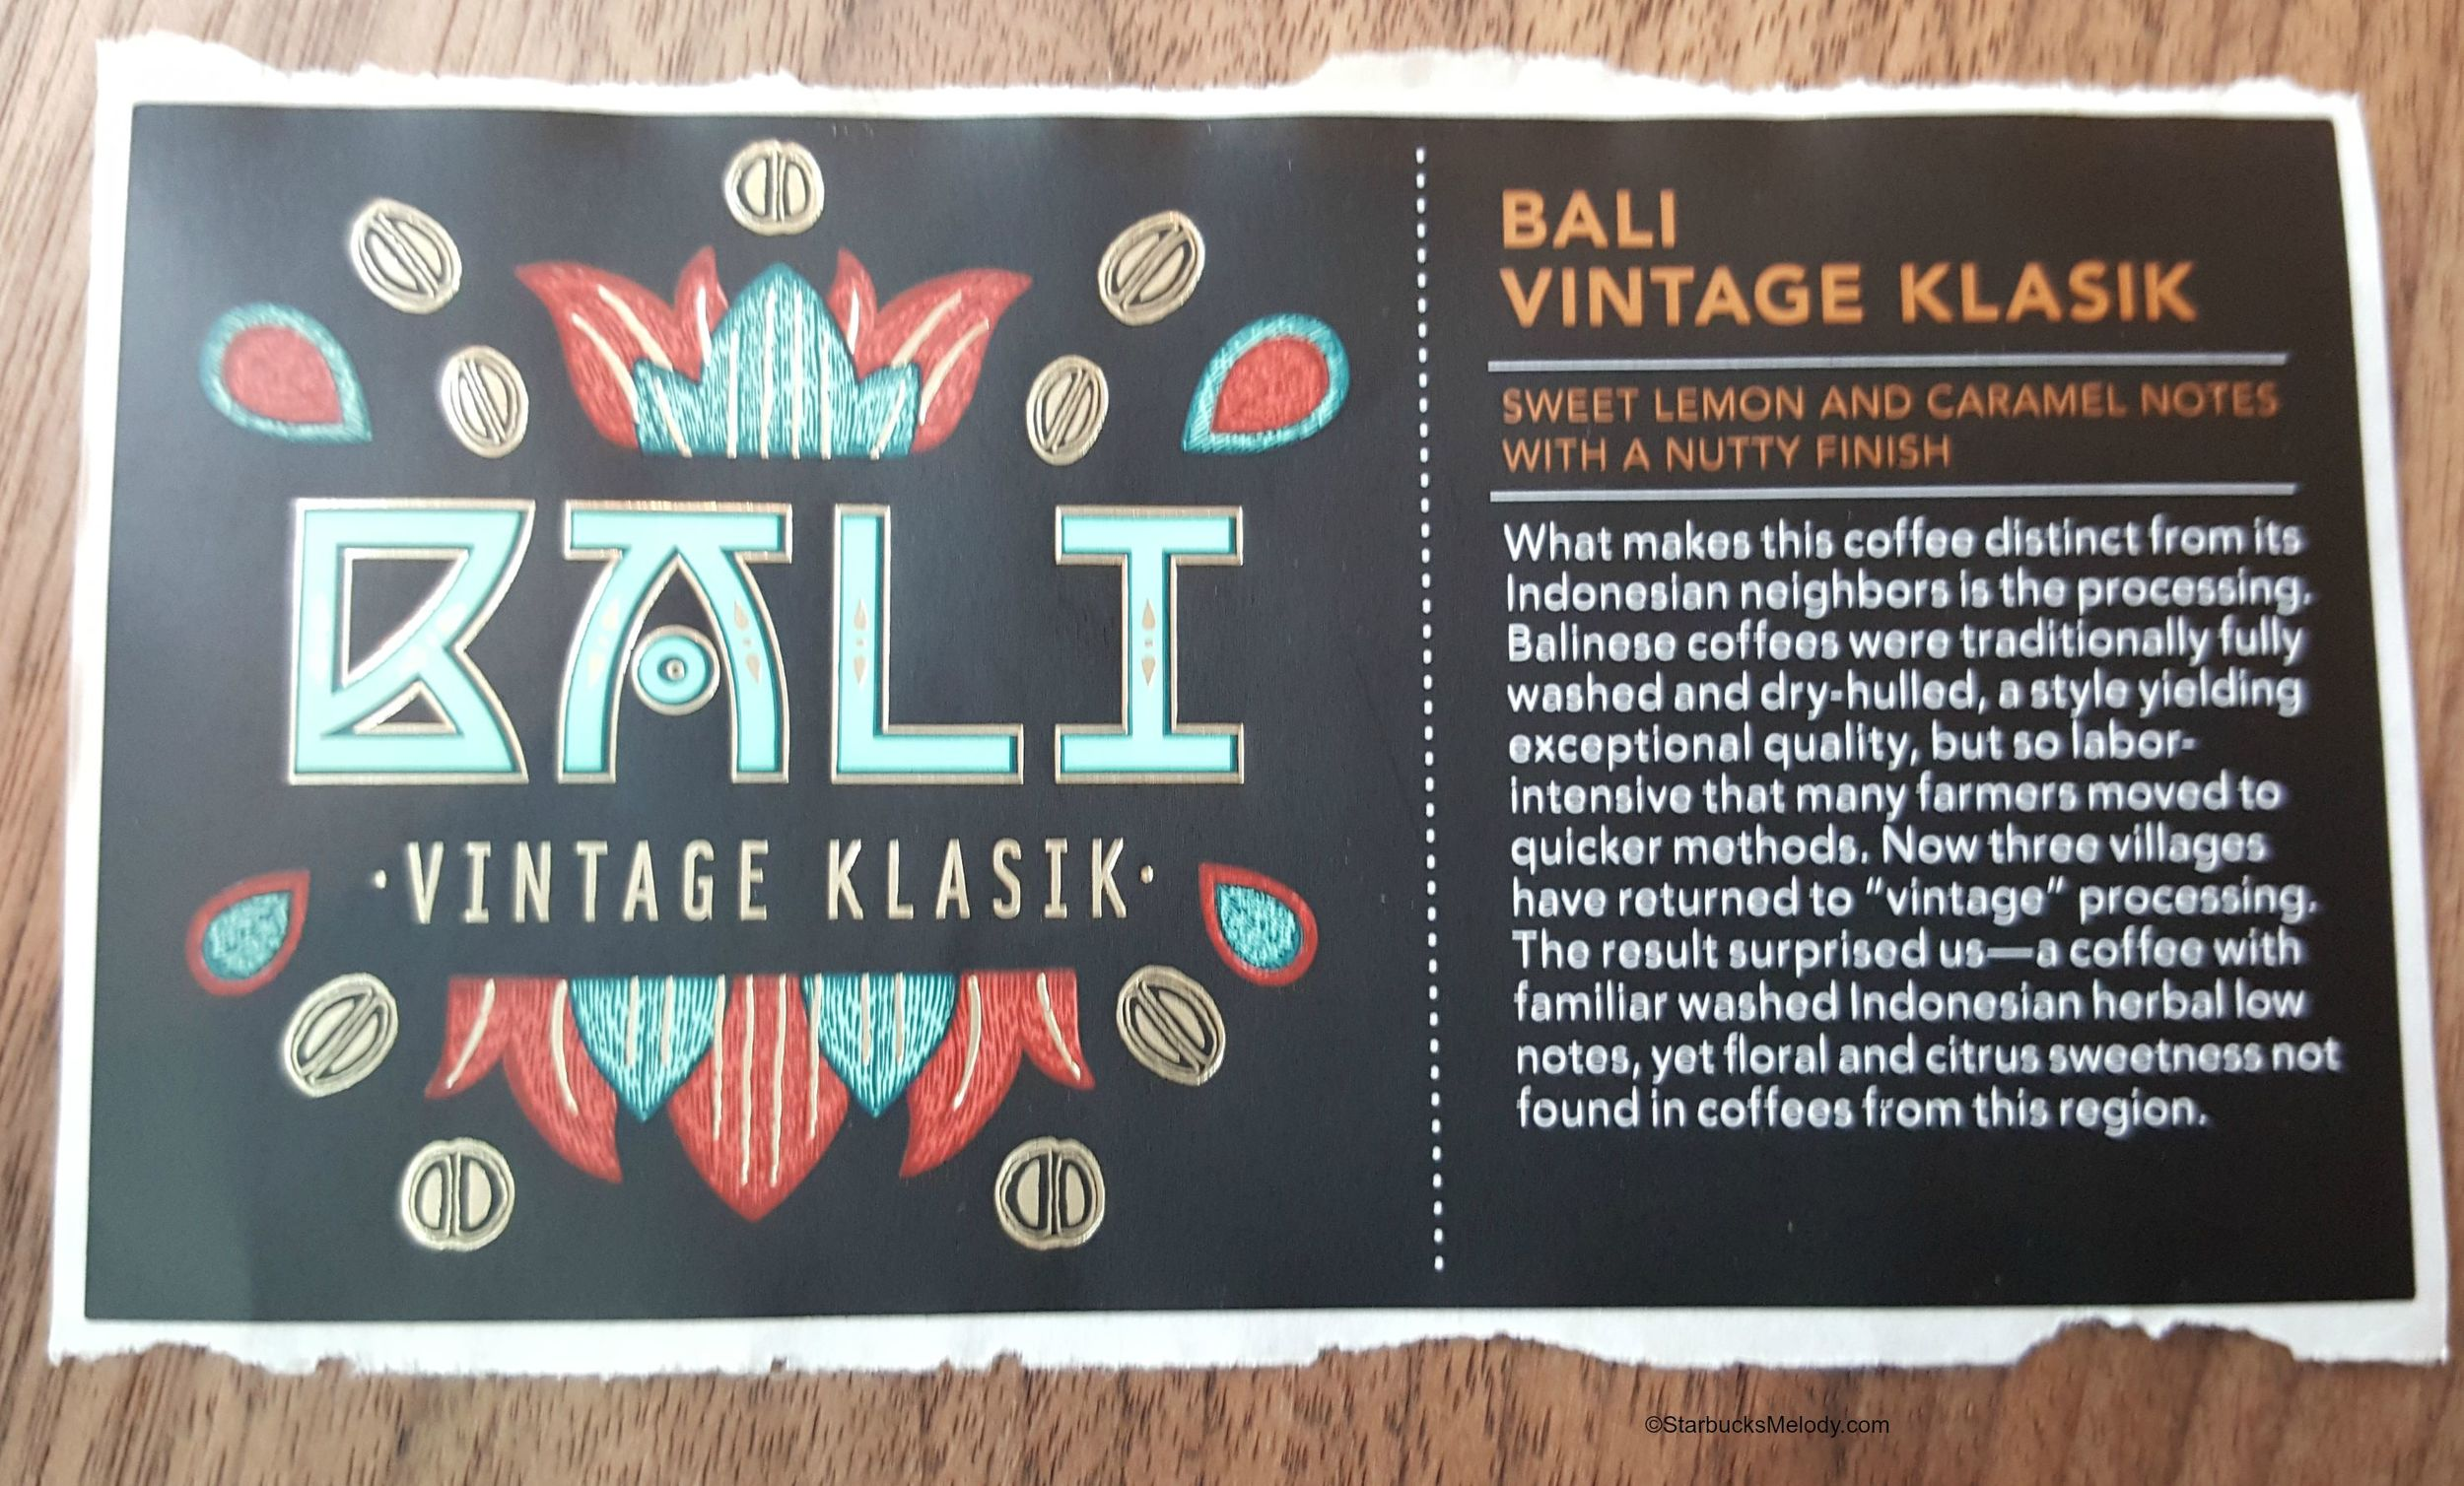 2 - 1 - 20150521_183833 sticker for bali vintage klasik.jpg